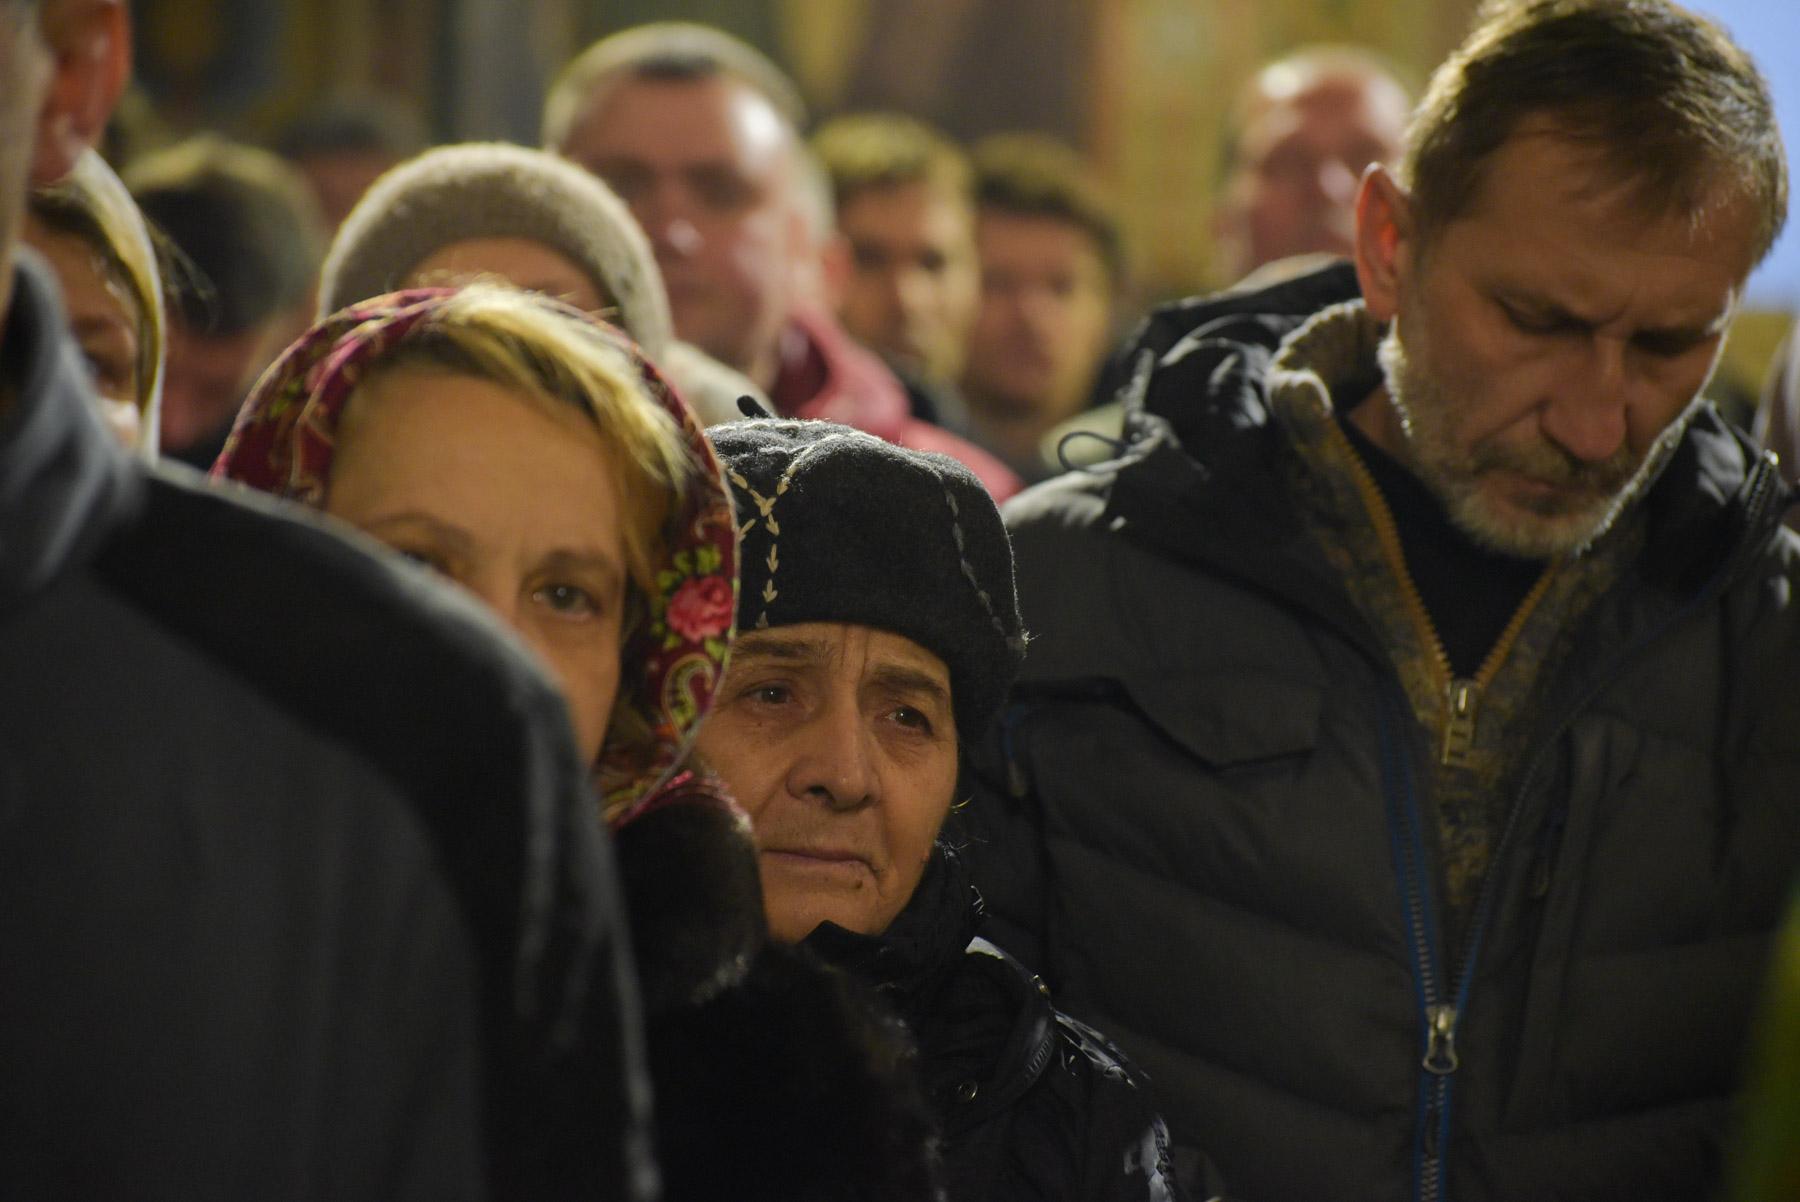 photos of orthodox christmas 0040 2